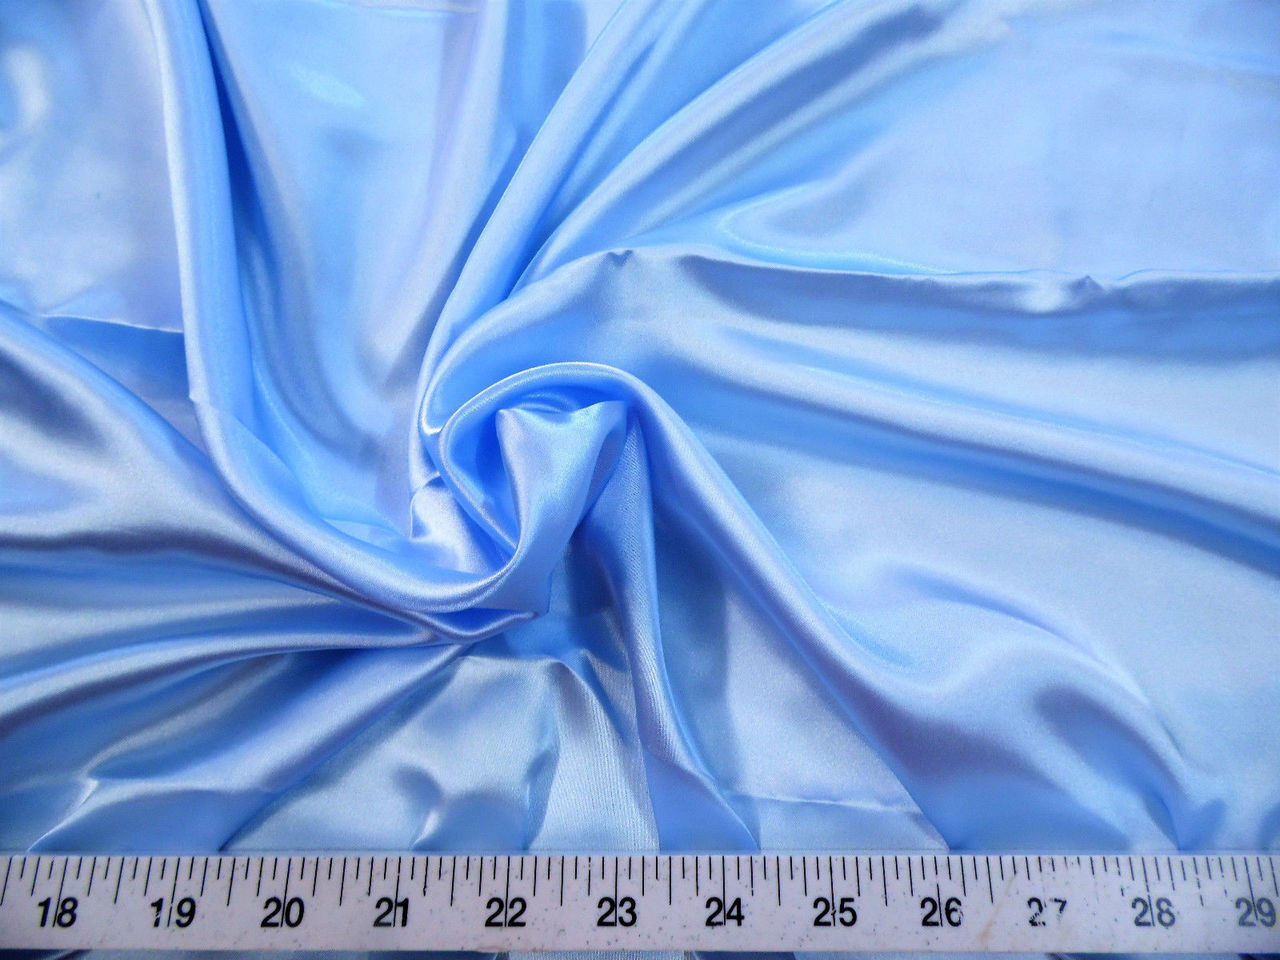 "Medium Starship Blue Oil Tanned Leather Strap 3//4/"" x 54/"" Strip 4-6 oz Hide"